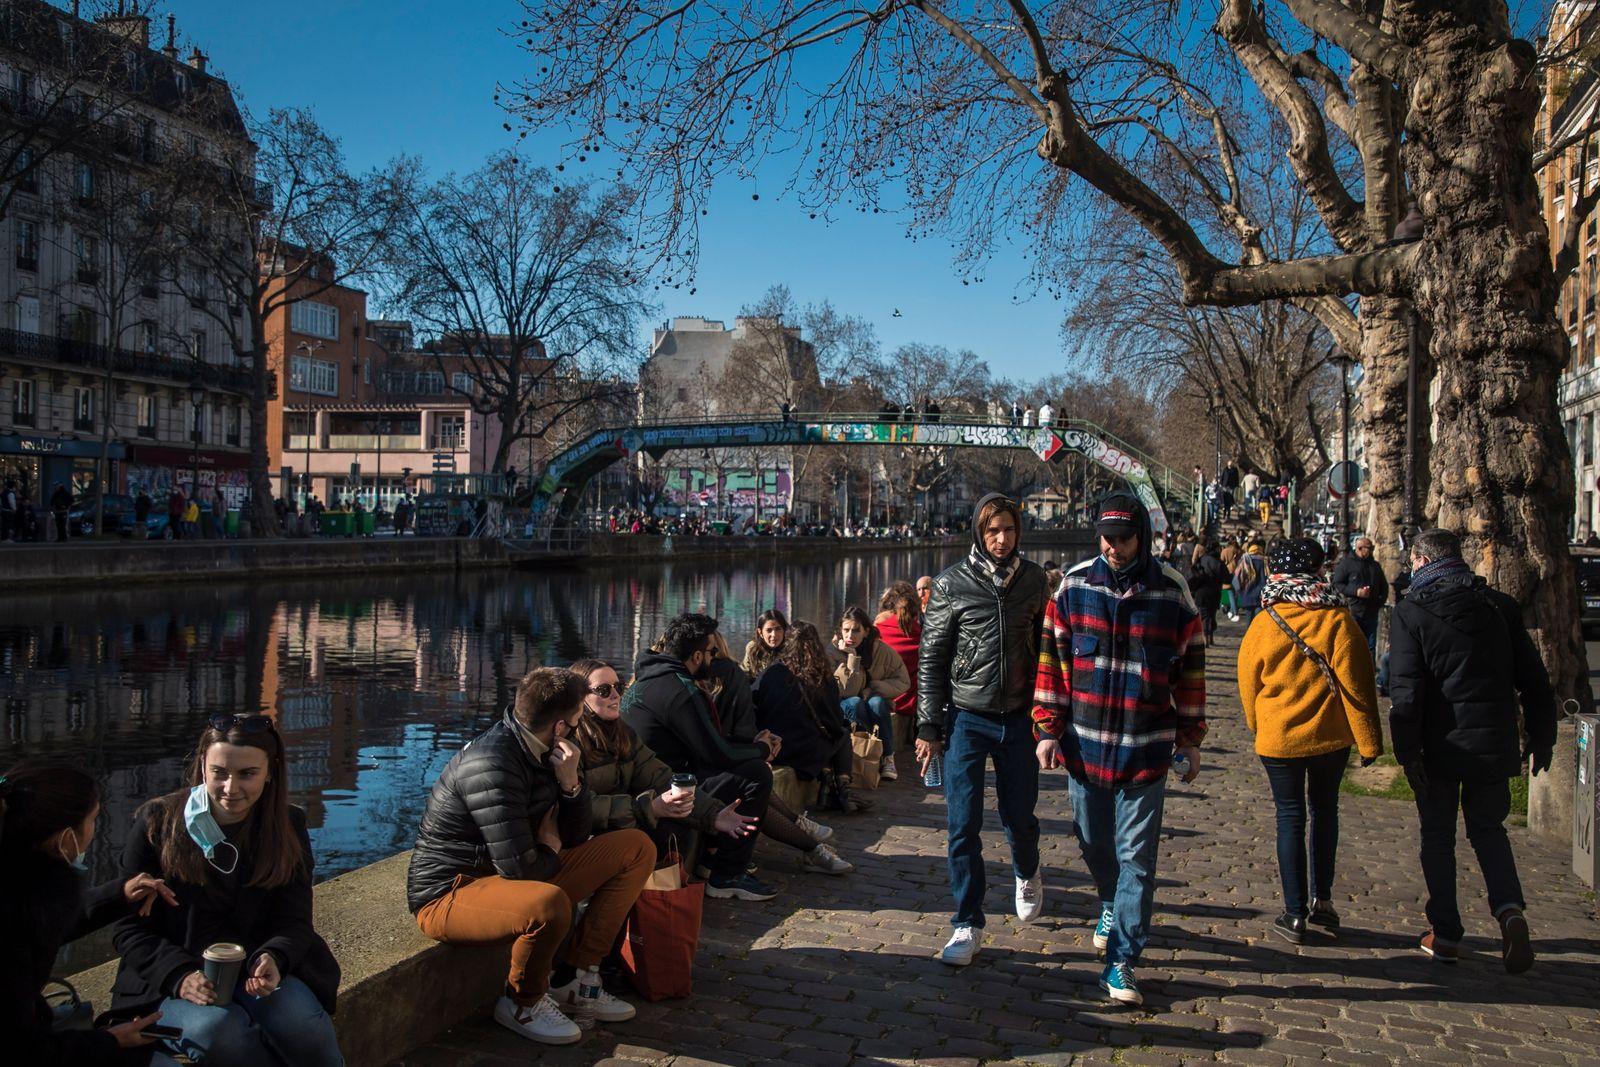 Parisians enjoy a sunny sunday along the banks of the Canal Saint Martin in Paris